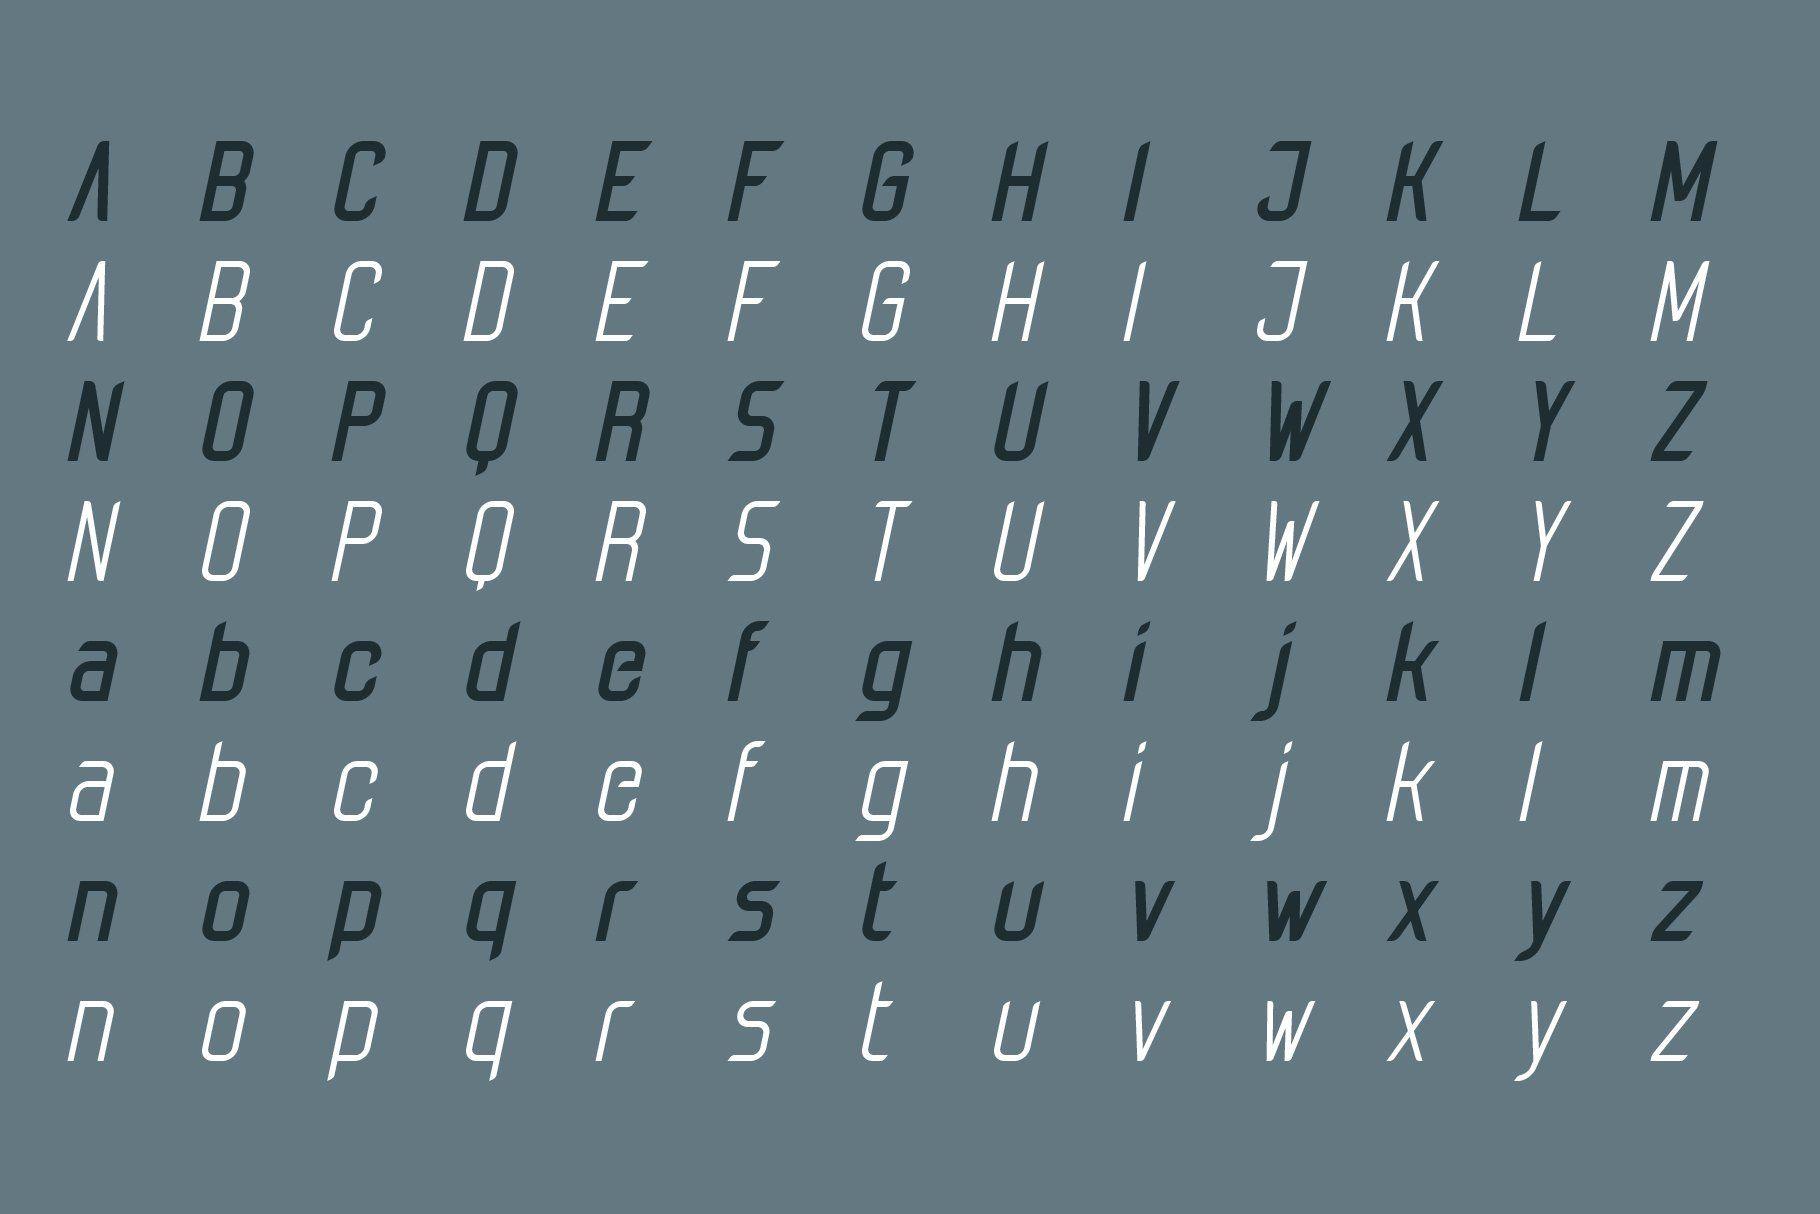 Tachyon Font - Condensed Sans Serif Font#Condensed#Tachyon